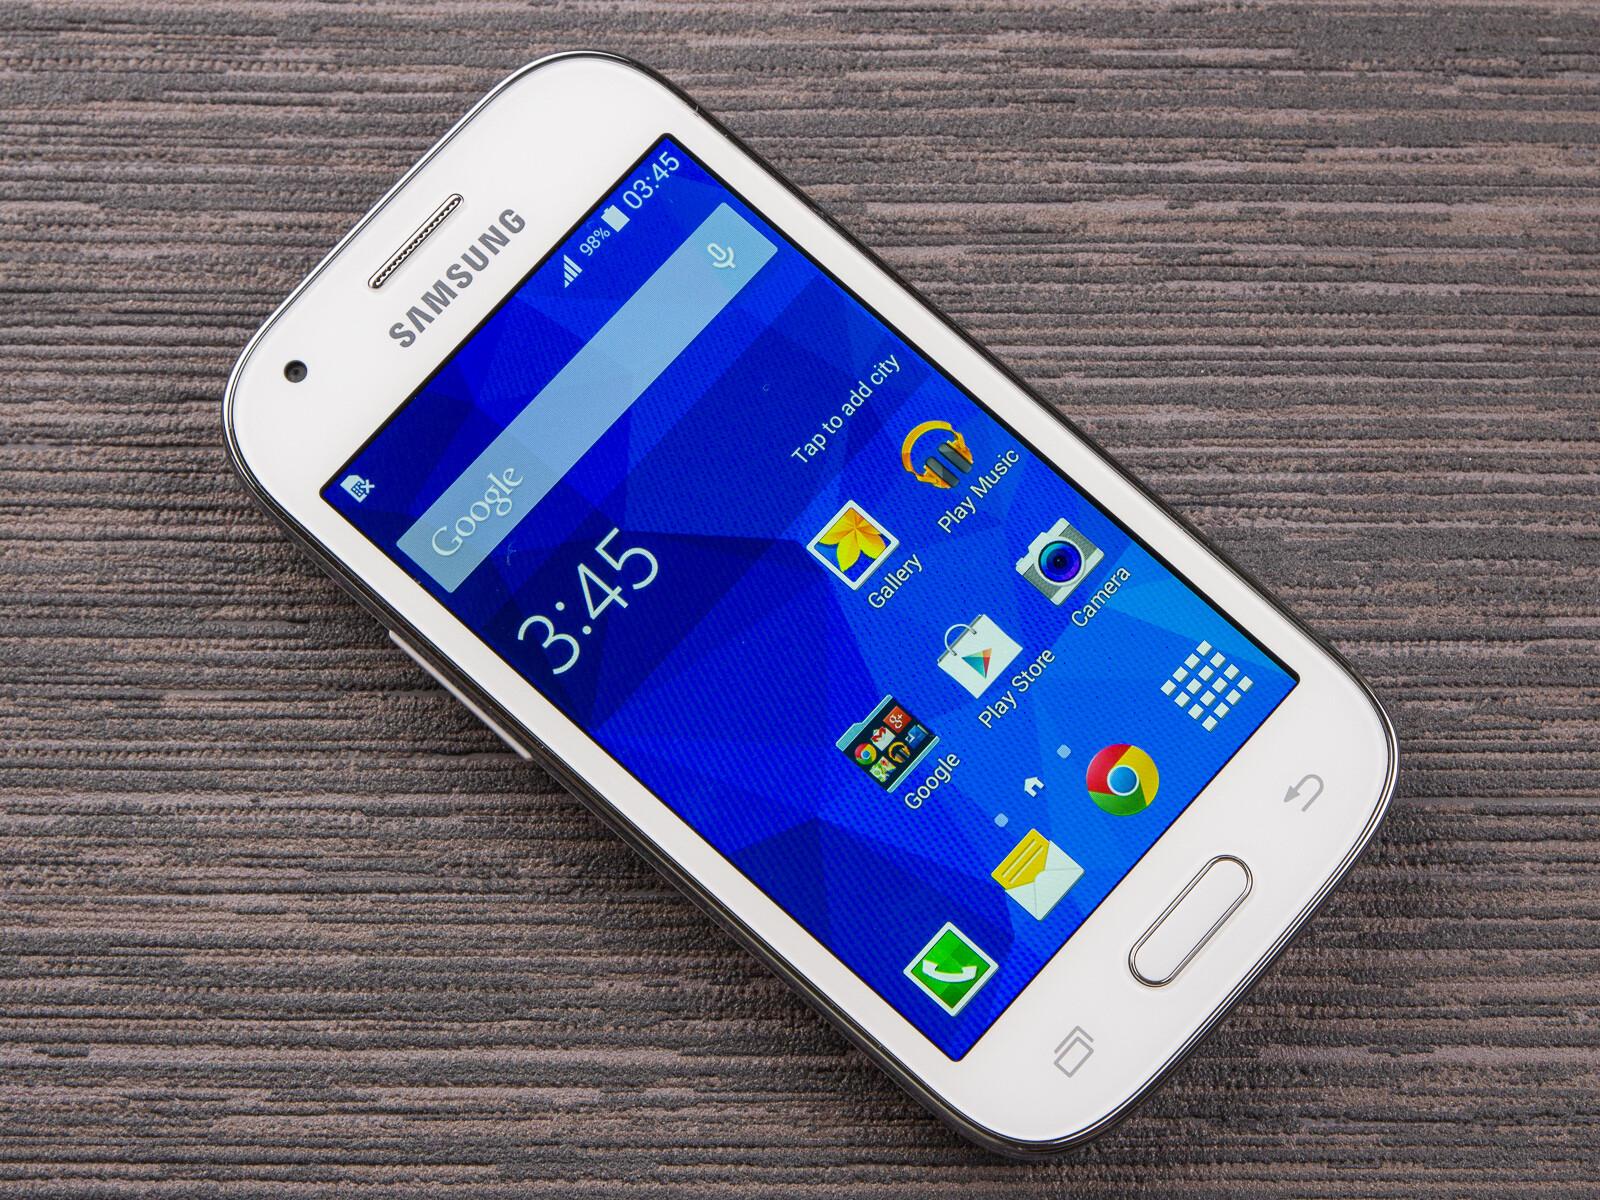 Samsung Galaxy Ace Style s